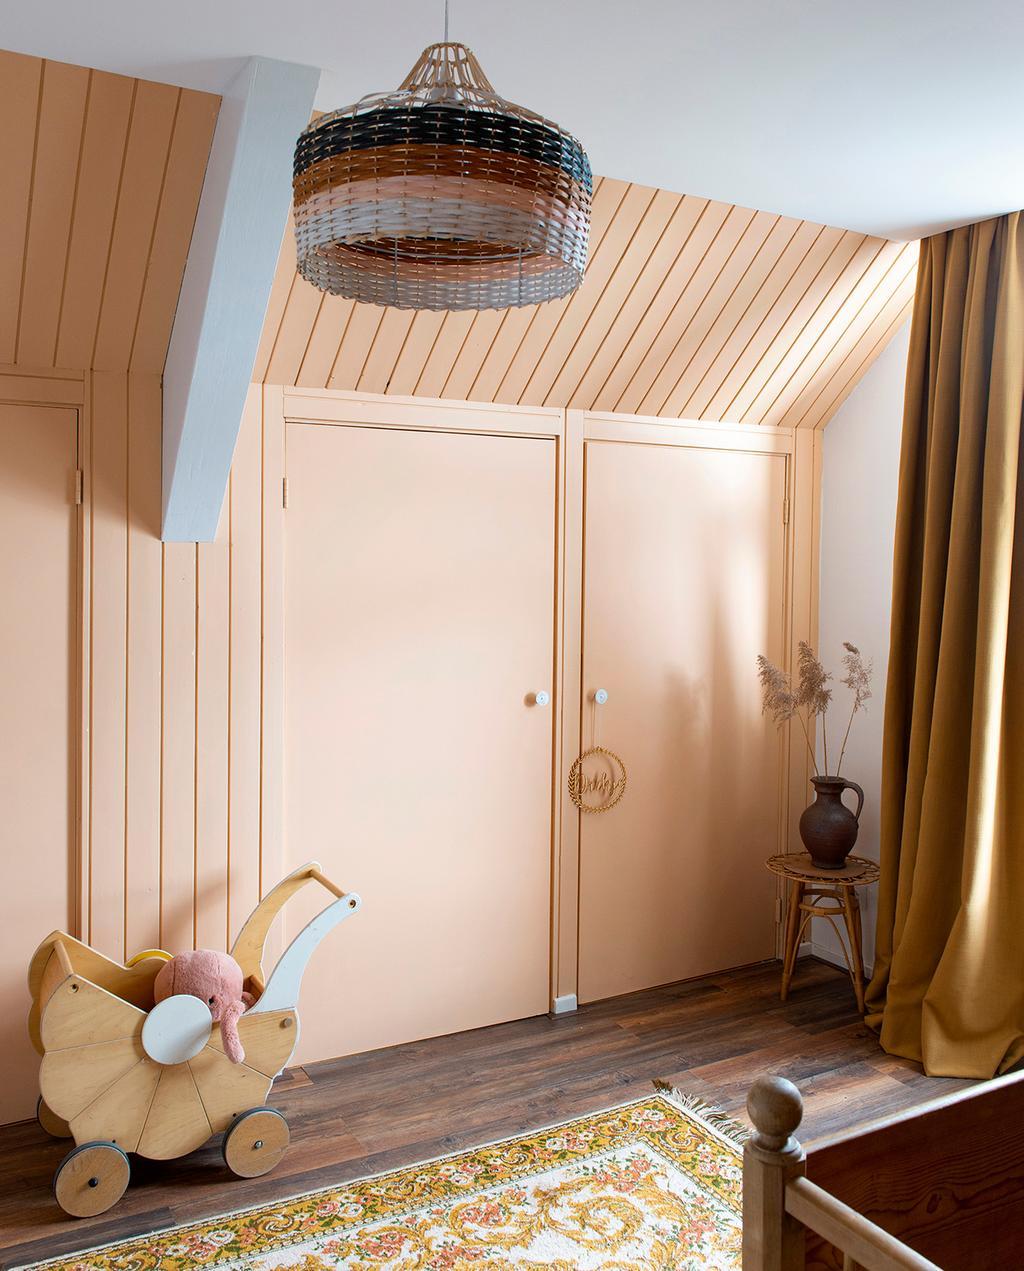 vtwonen 08-2020 | binnenkijken Arnhem kinderkamer zalmroze kasten